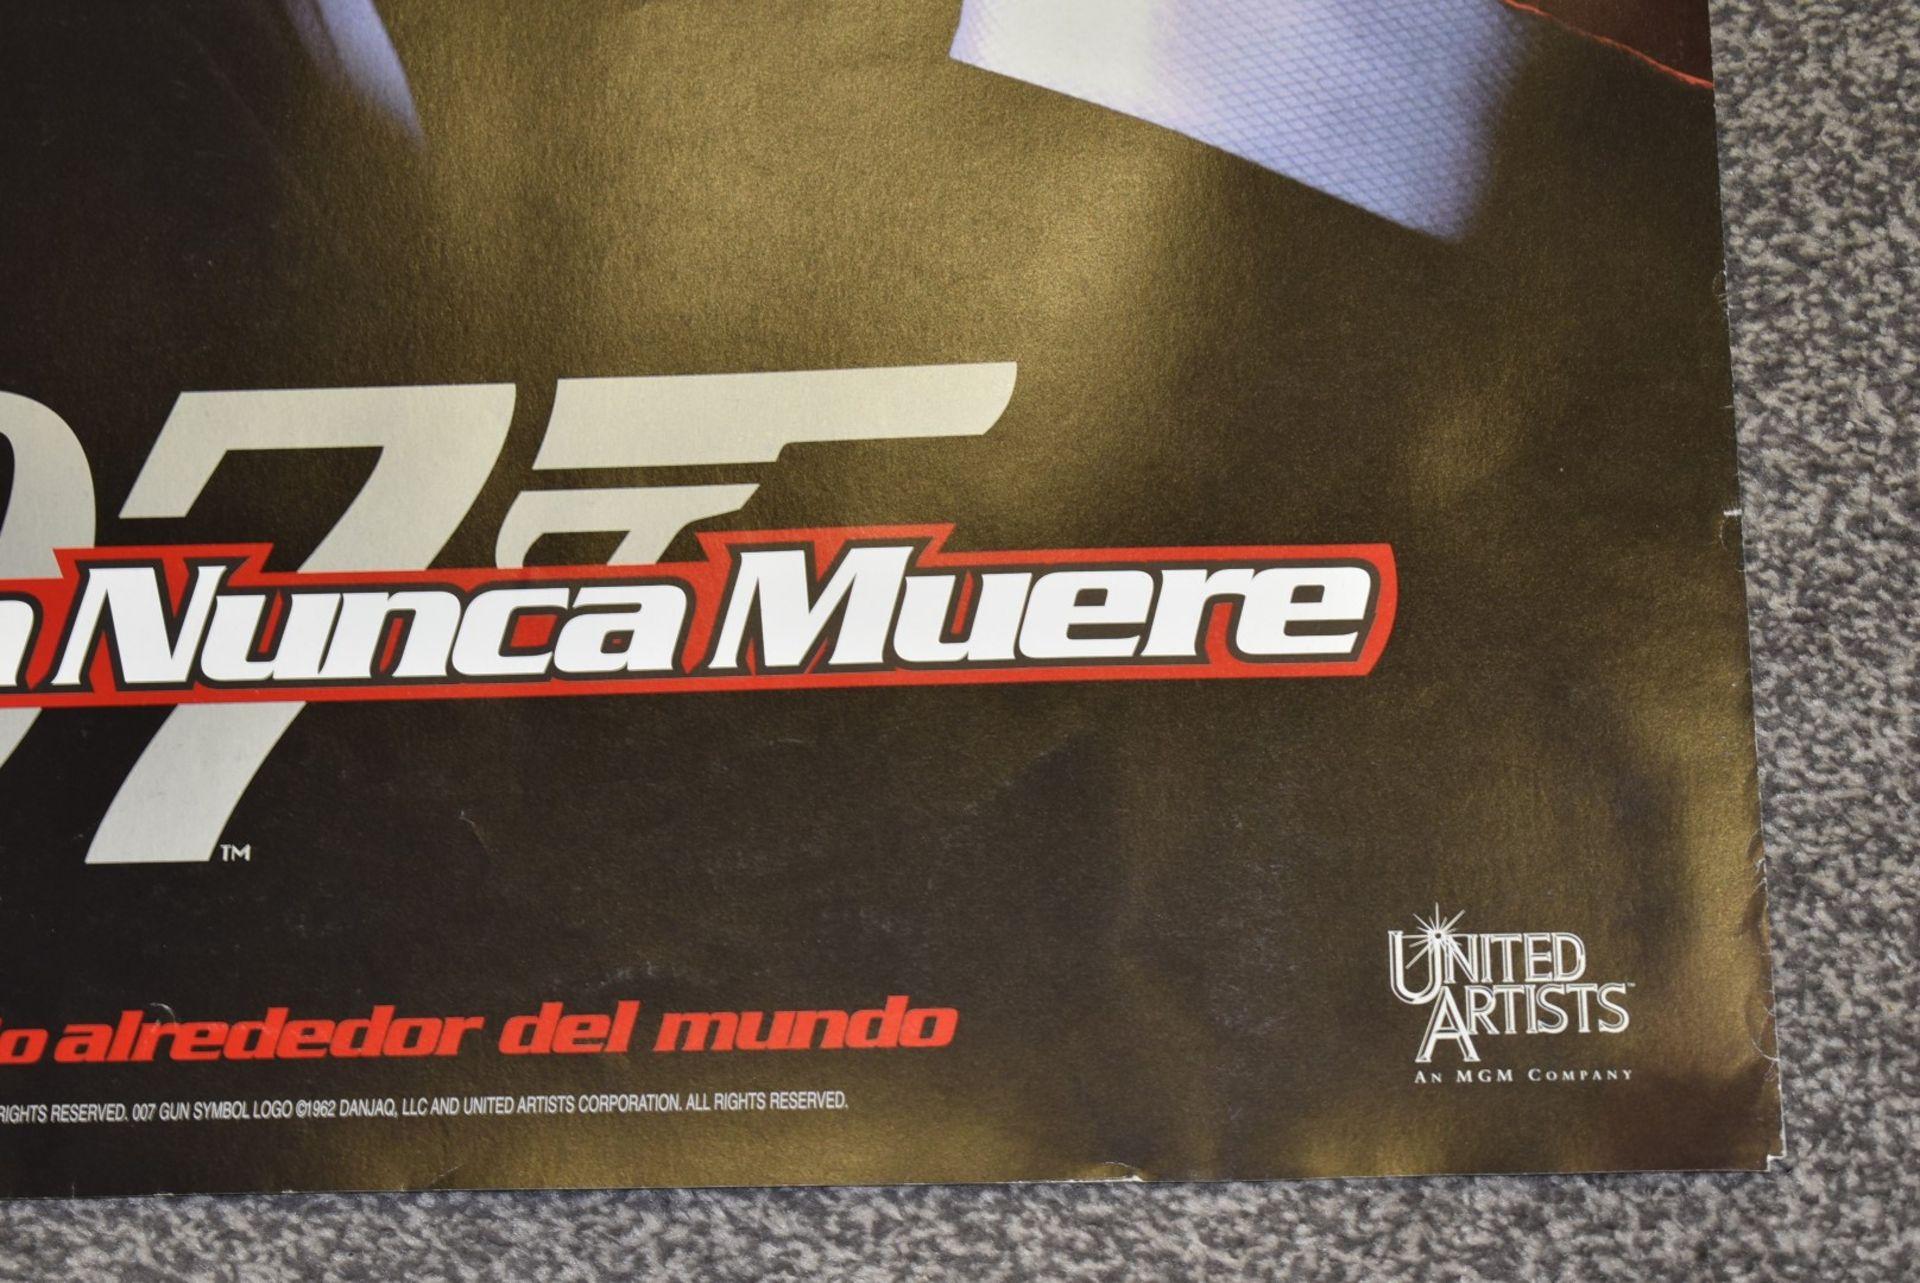 Lot 4072 - 1 x Spanish Double Side Movie Poster - JAMES BOND 007 TOMORROW NEVER DIES - StarringPierce Brosnan,